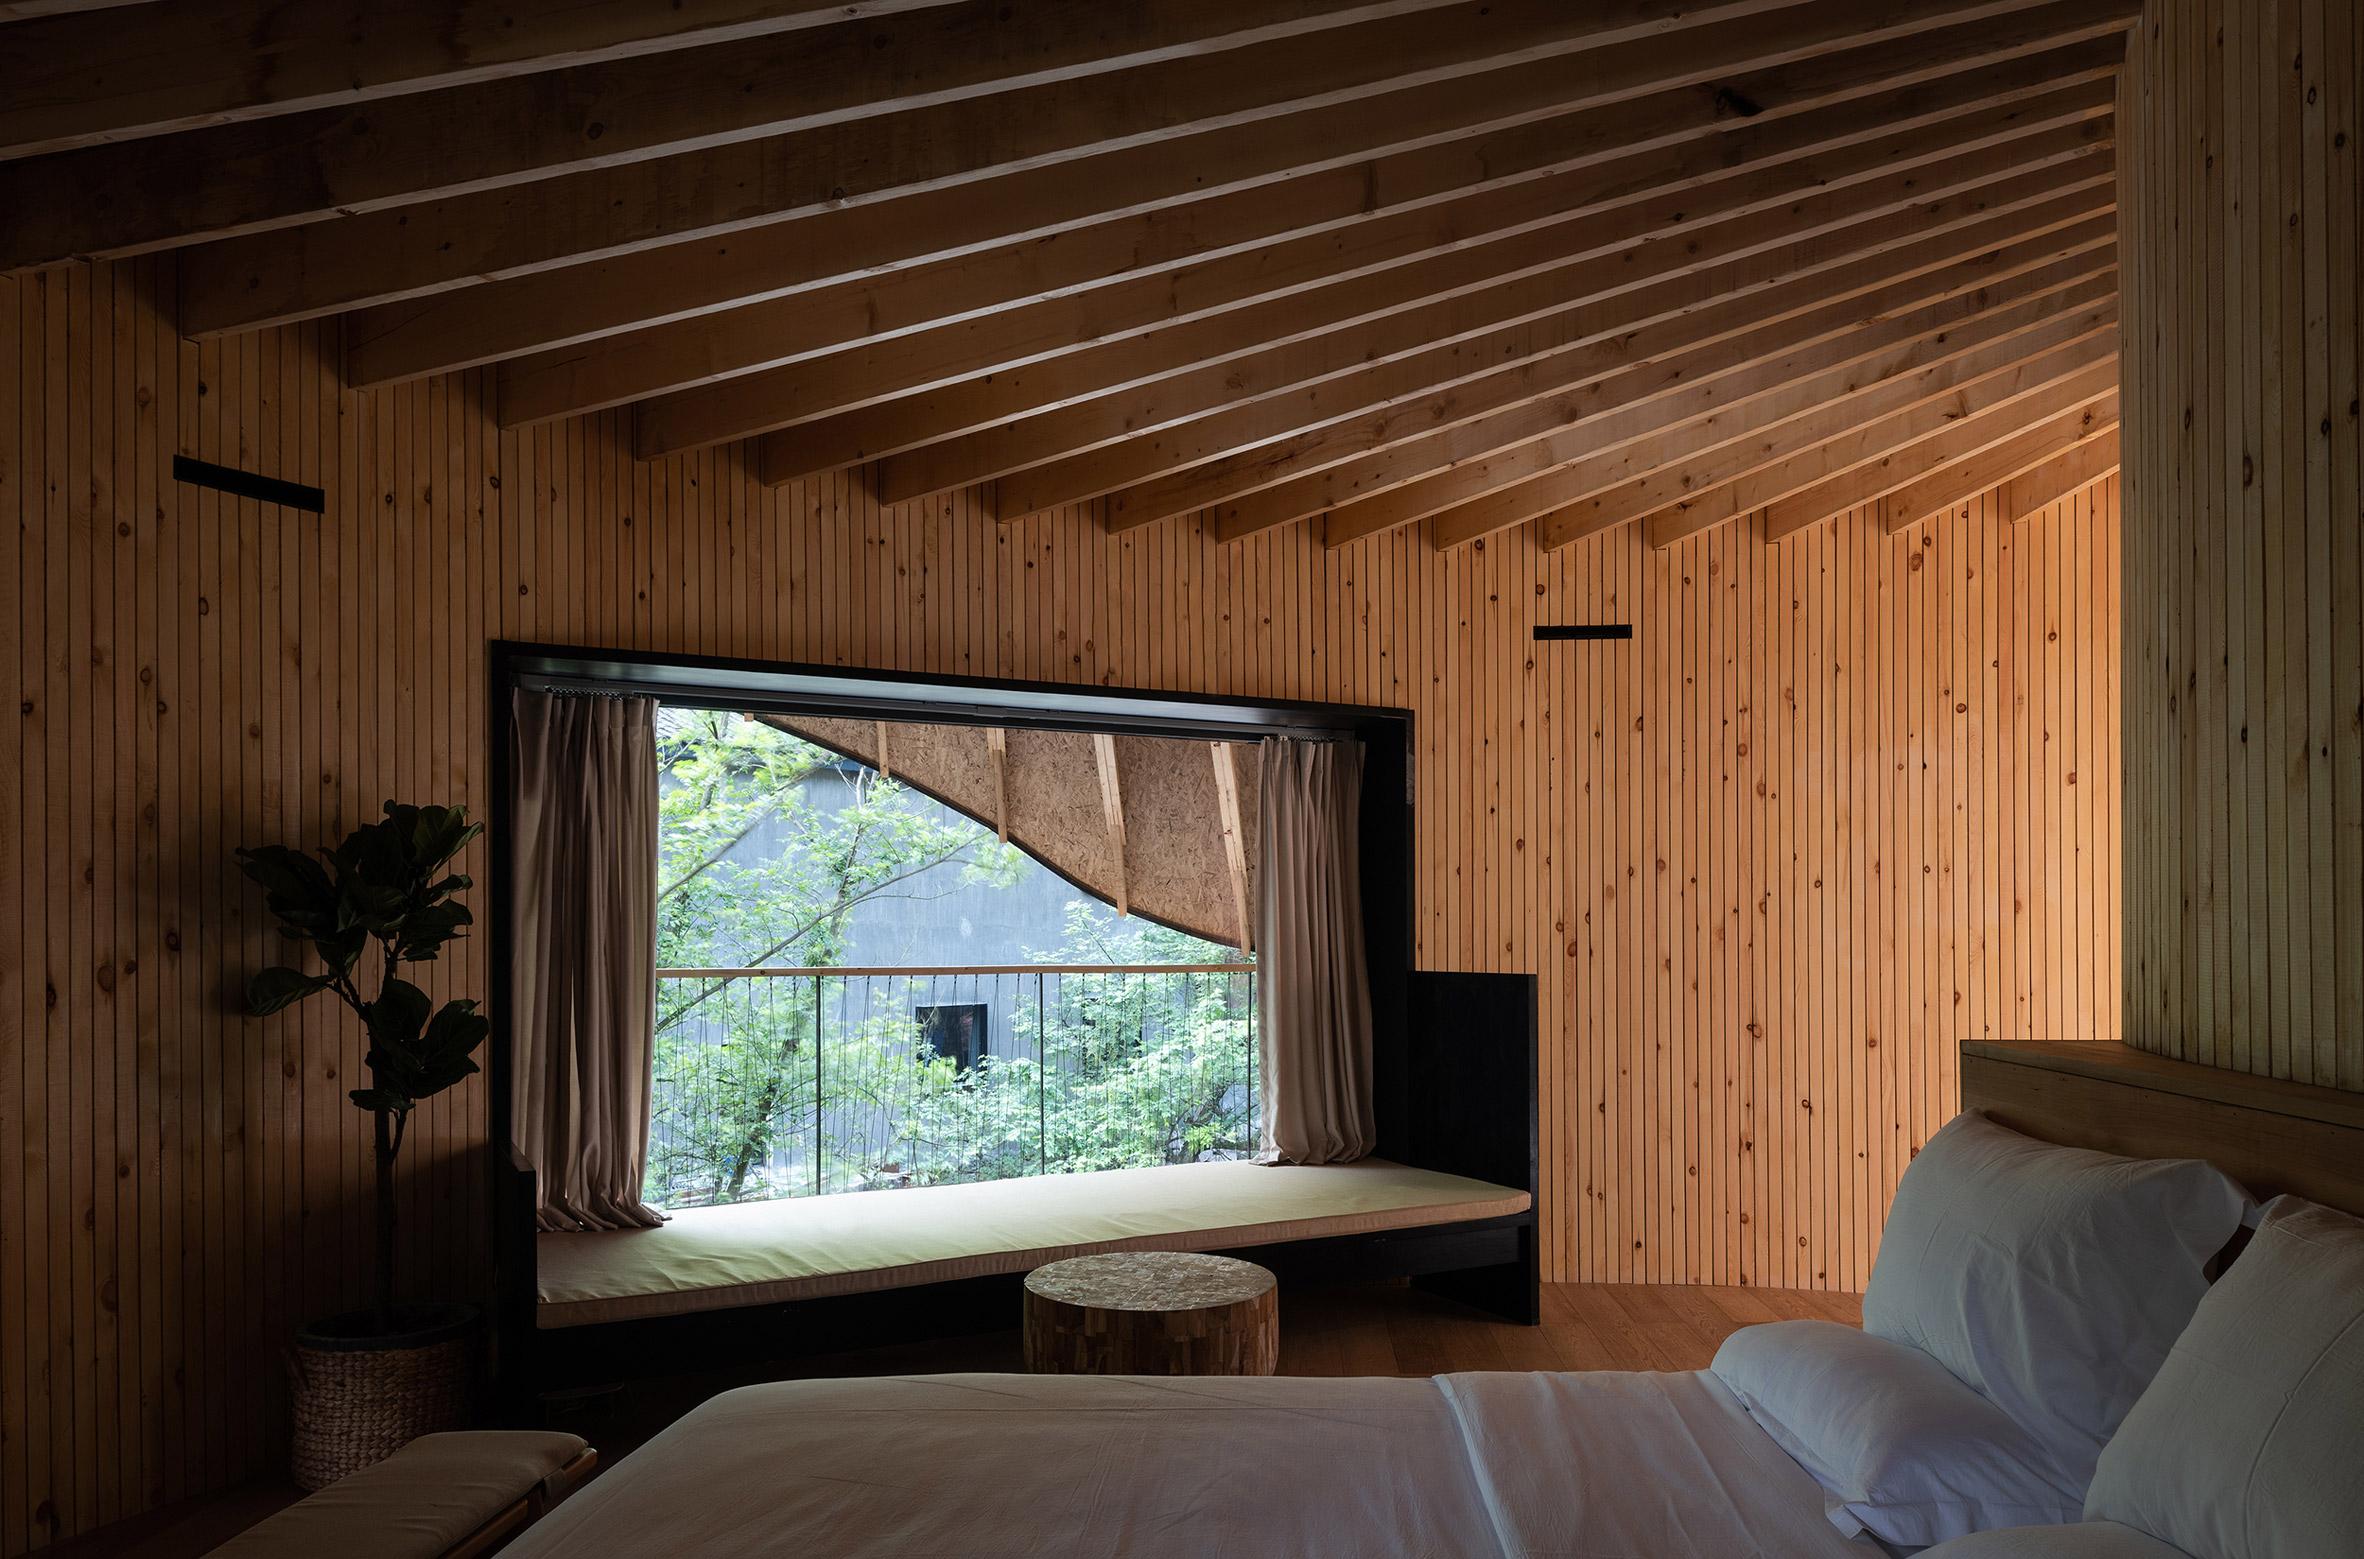 nơi nghỉ dưỡng treewow-treehouse-monoarchi-architecture-xband-club-zhongcun-4